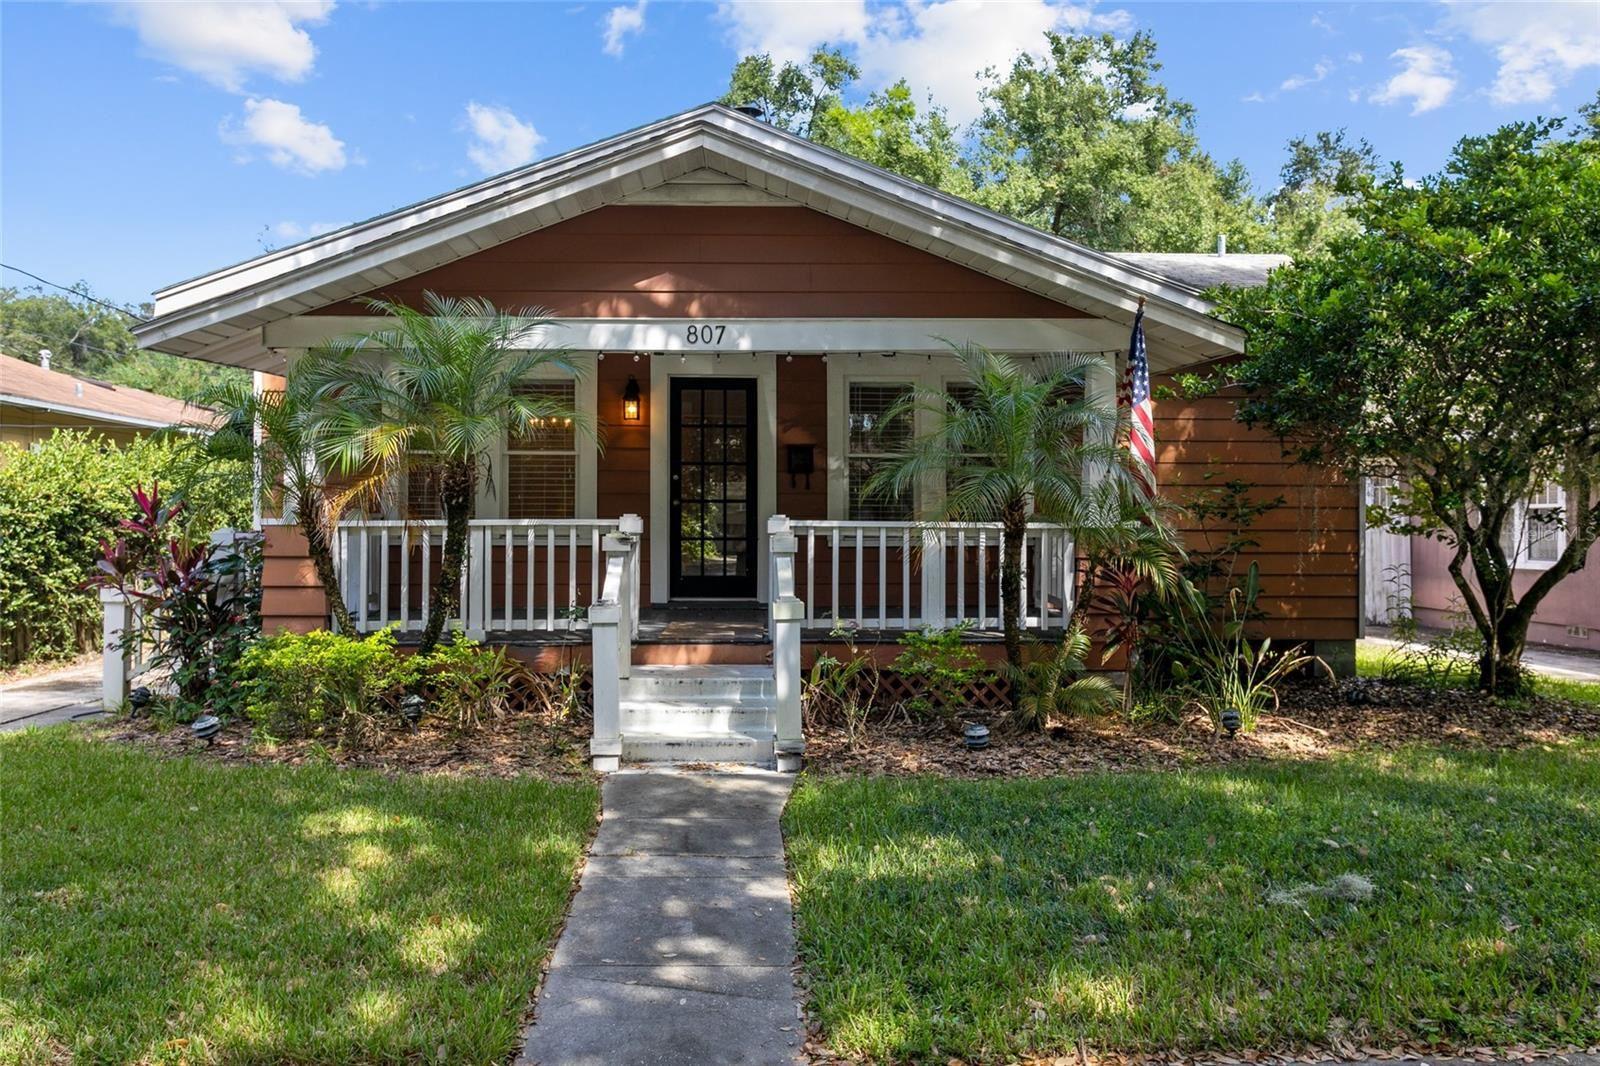 807 PALMER STREET, Orlando, FL 32801 - #: O5980120